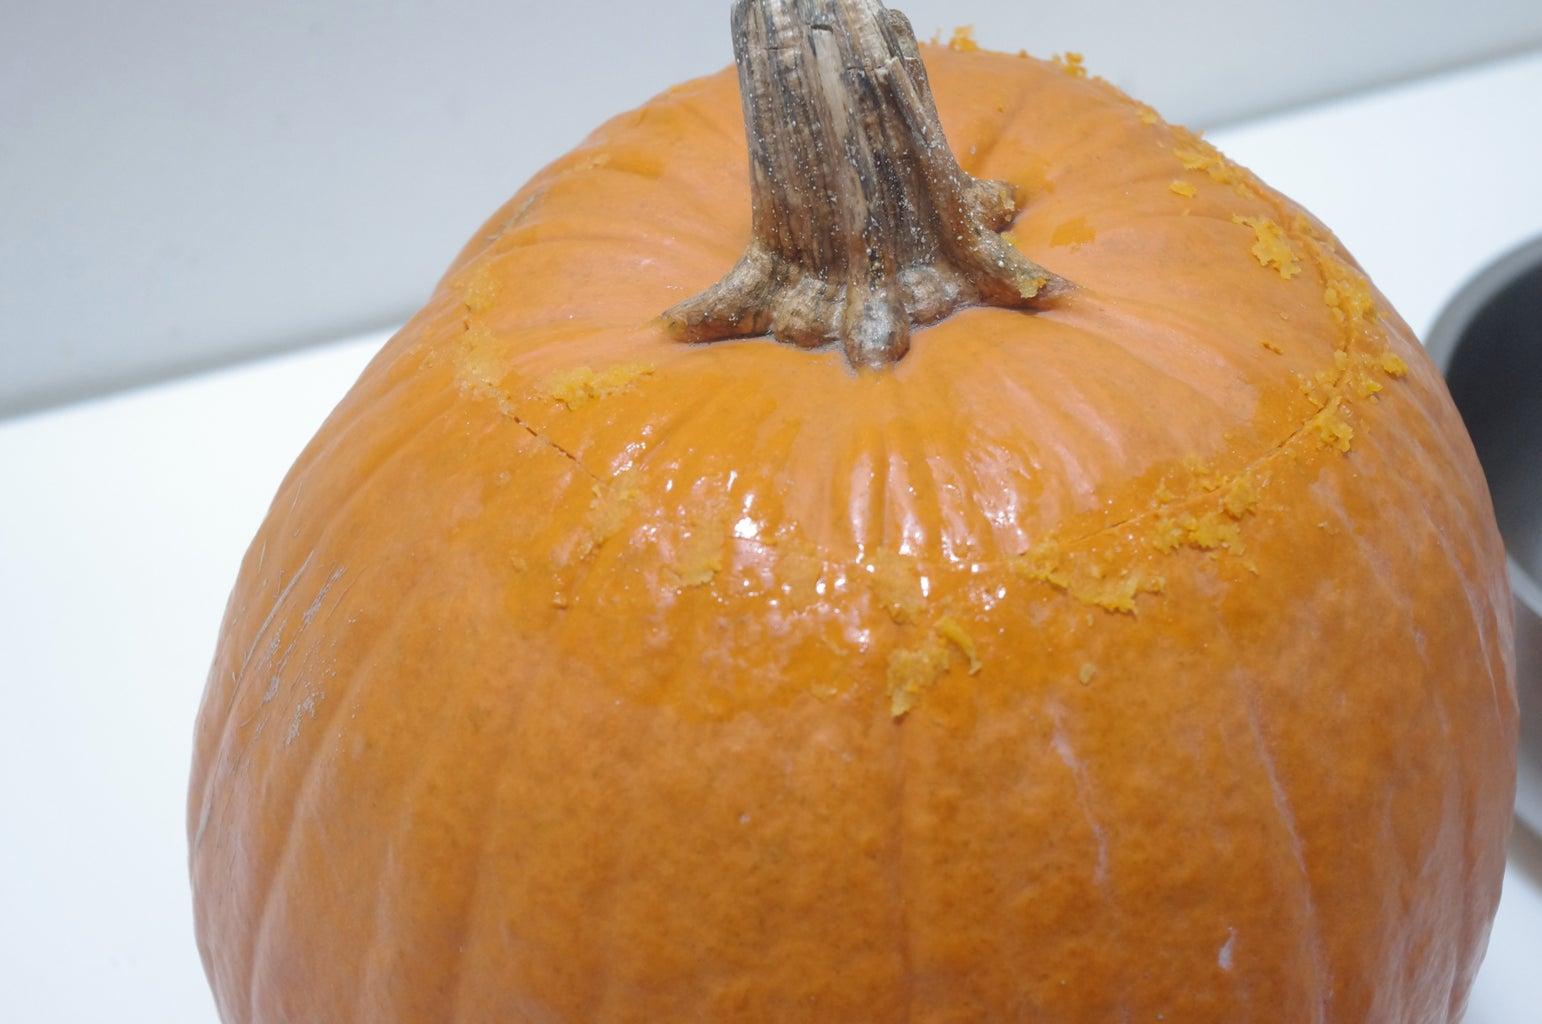 Open and Clean Pumpkin